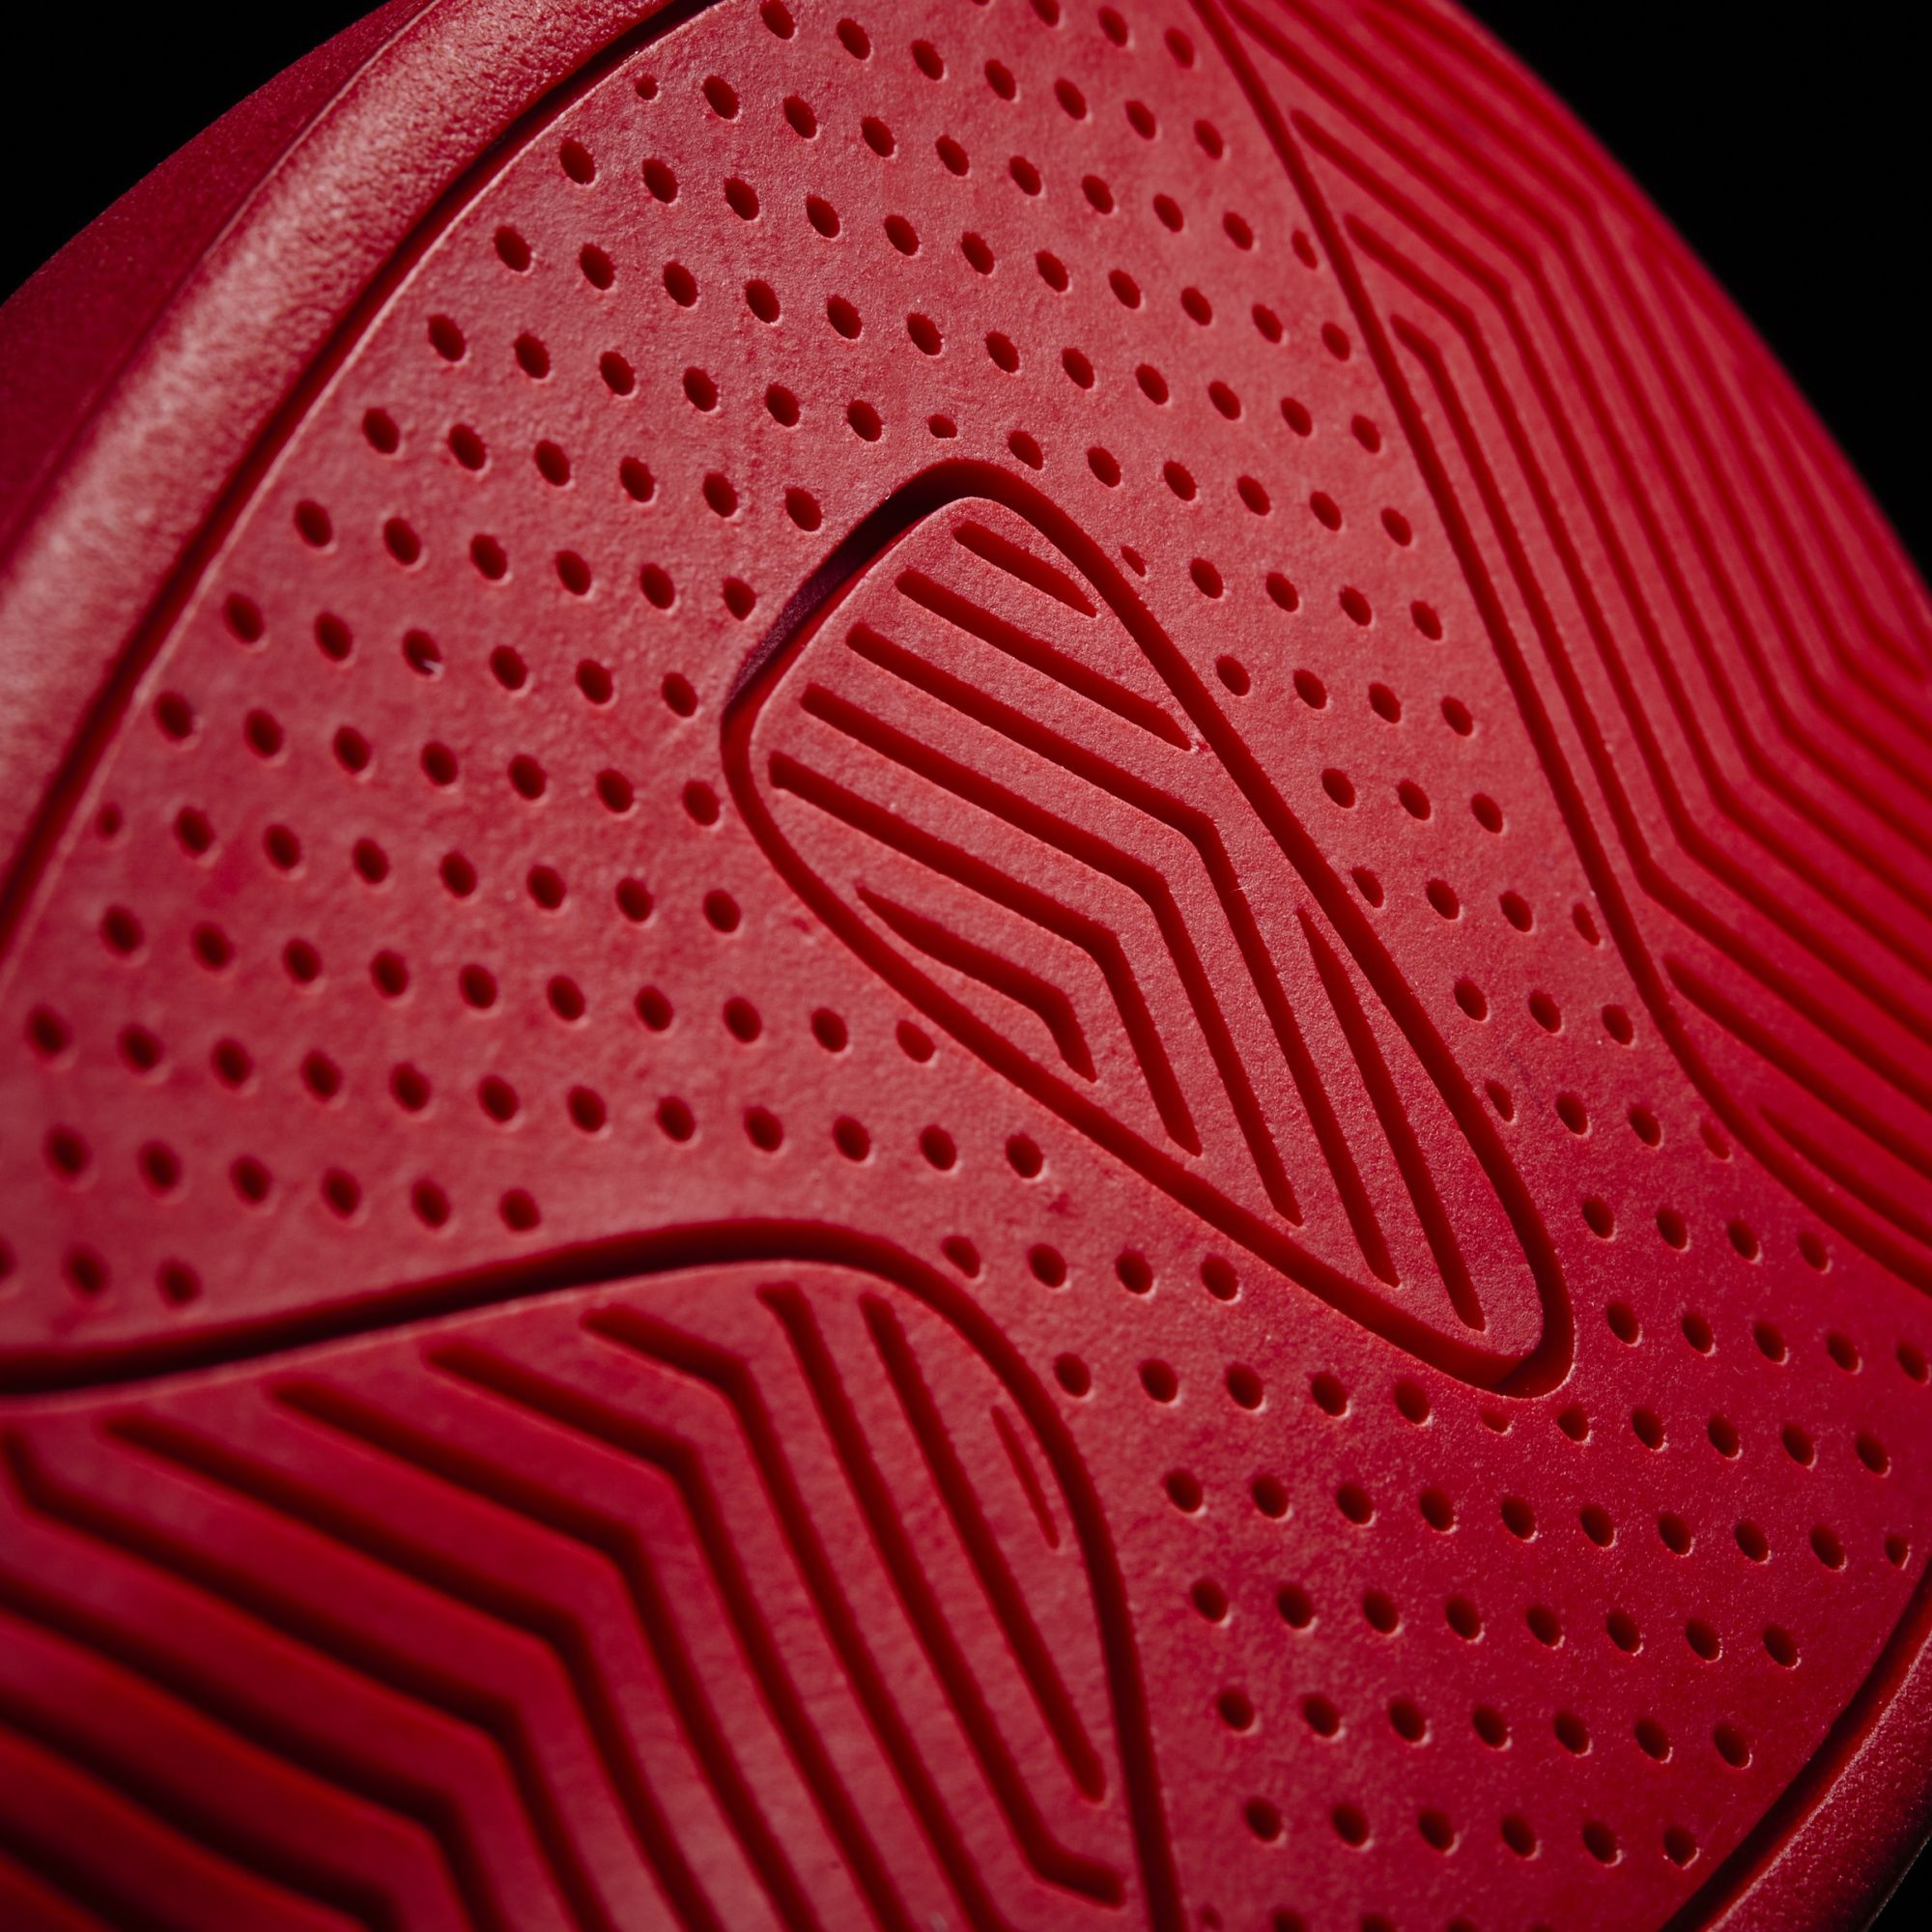 adidas Tubular Invader Red October Sole Close